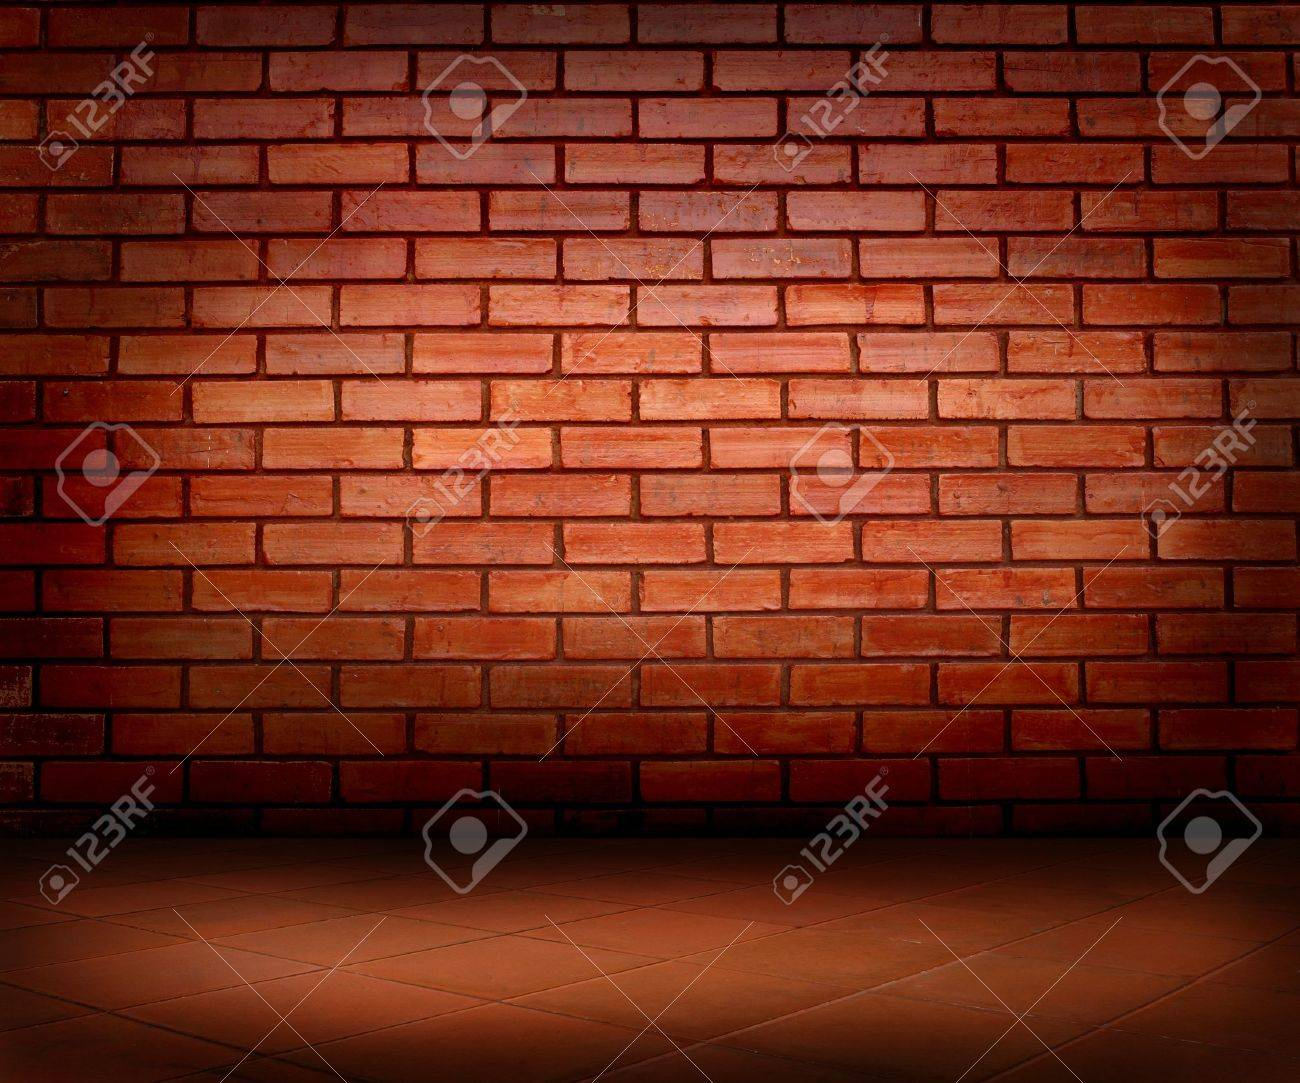 brick wall and floor Stock Photo - 10608867